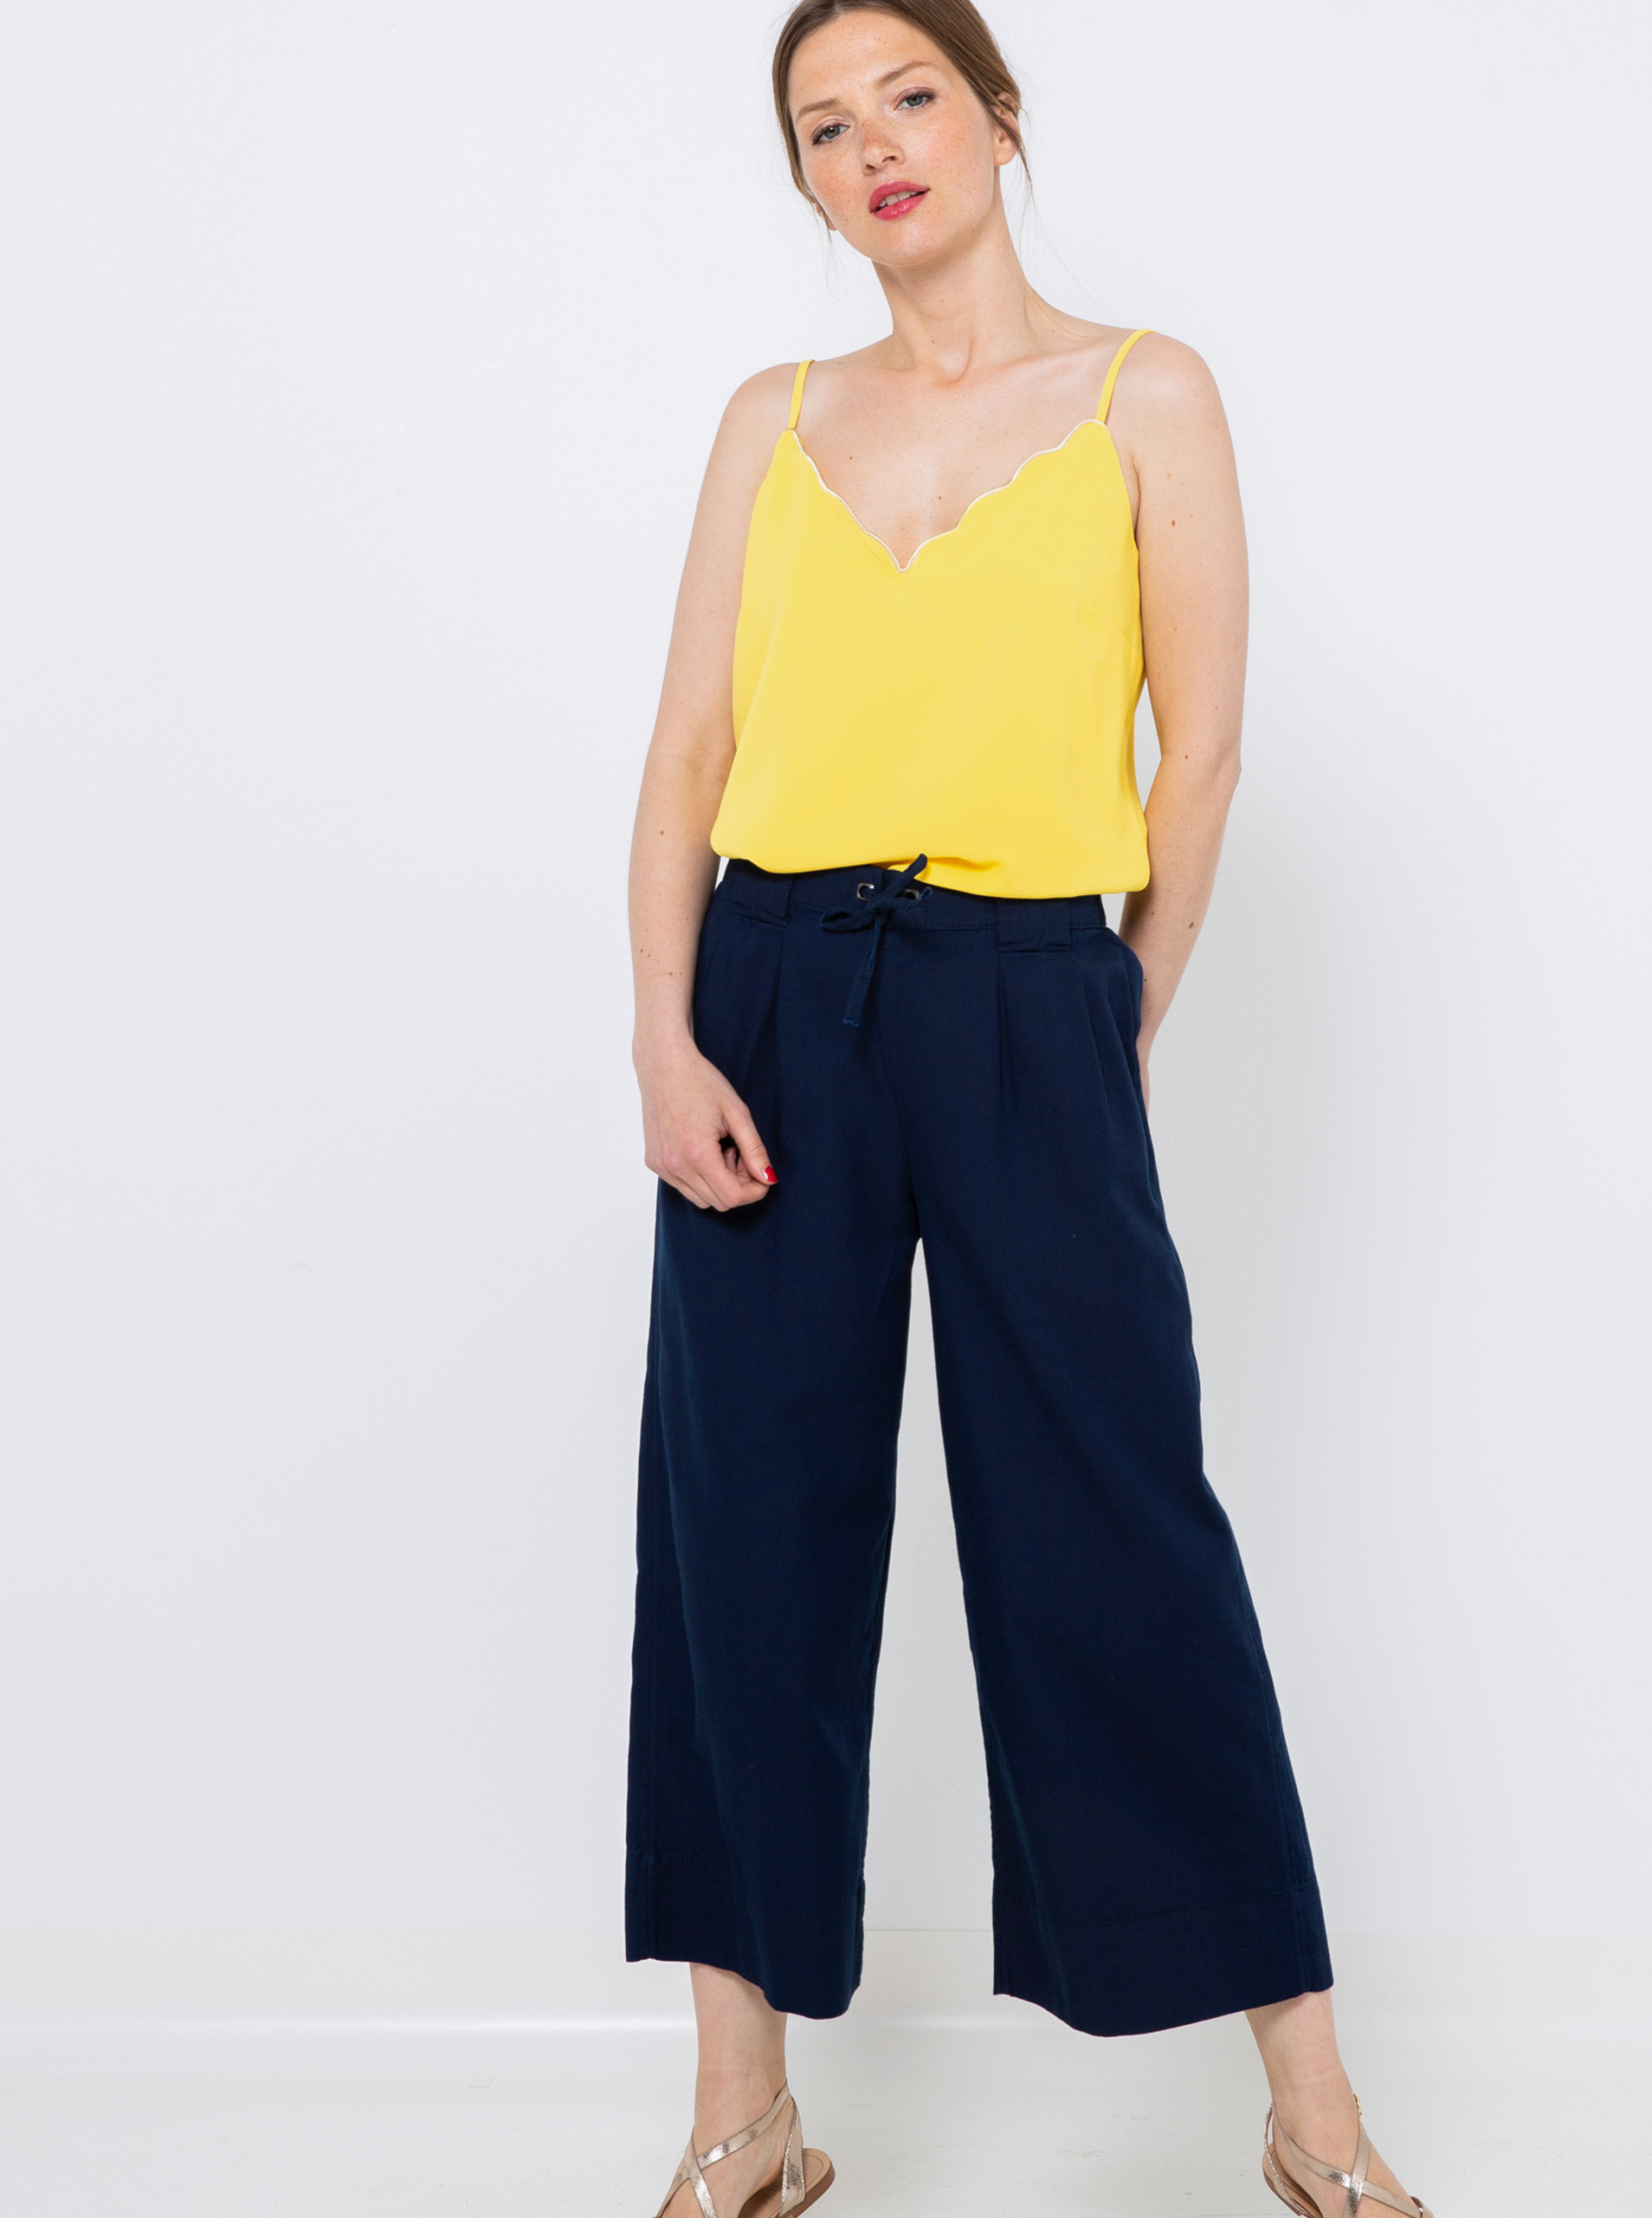 CAMAIEU żółty damski top